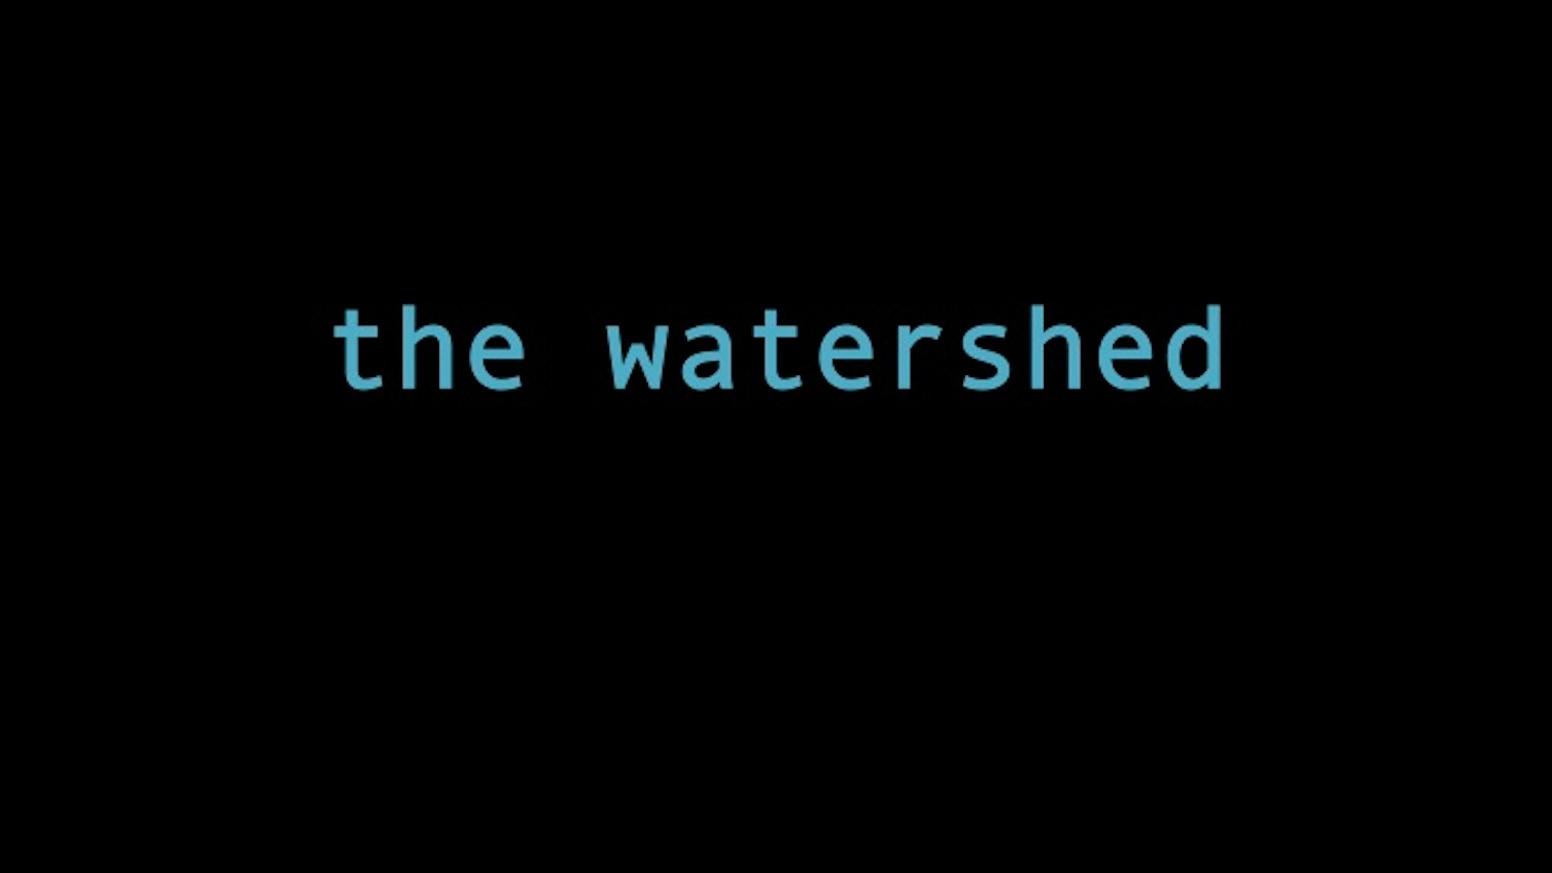 The Watershed Staging Workshop by Porte Parole — Kickstarter